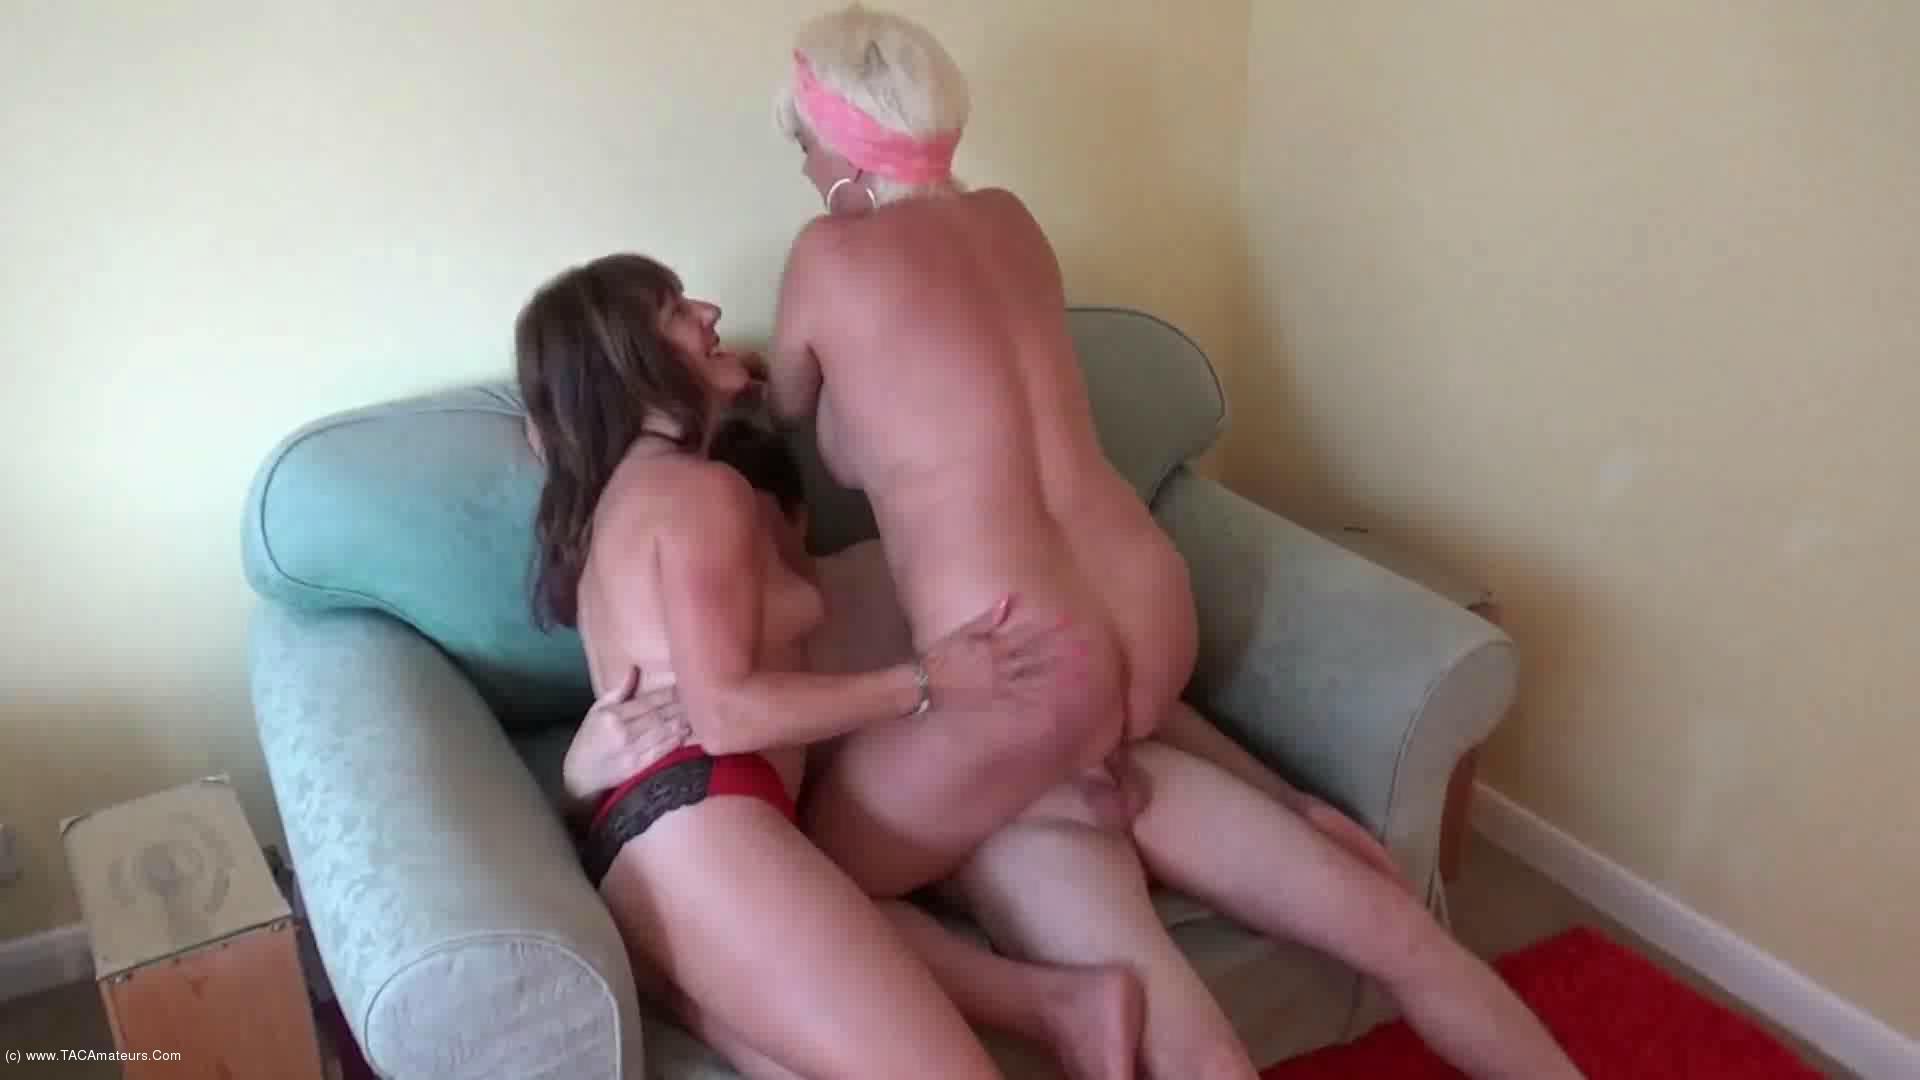 PhillipasLadies - Dimonty Rides A Cock scene 0